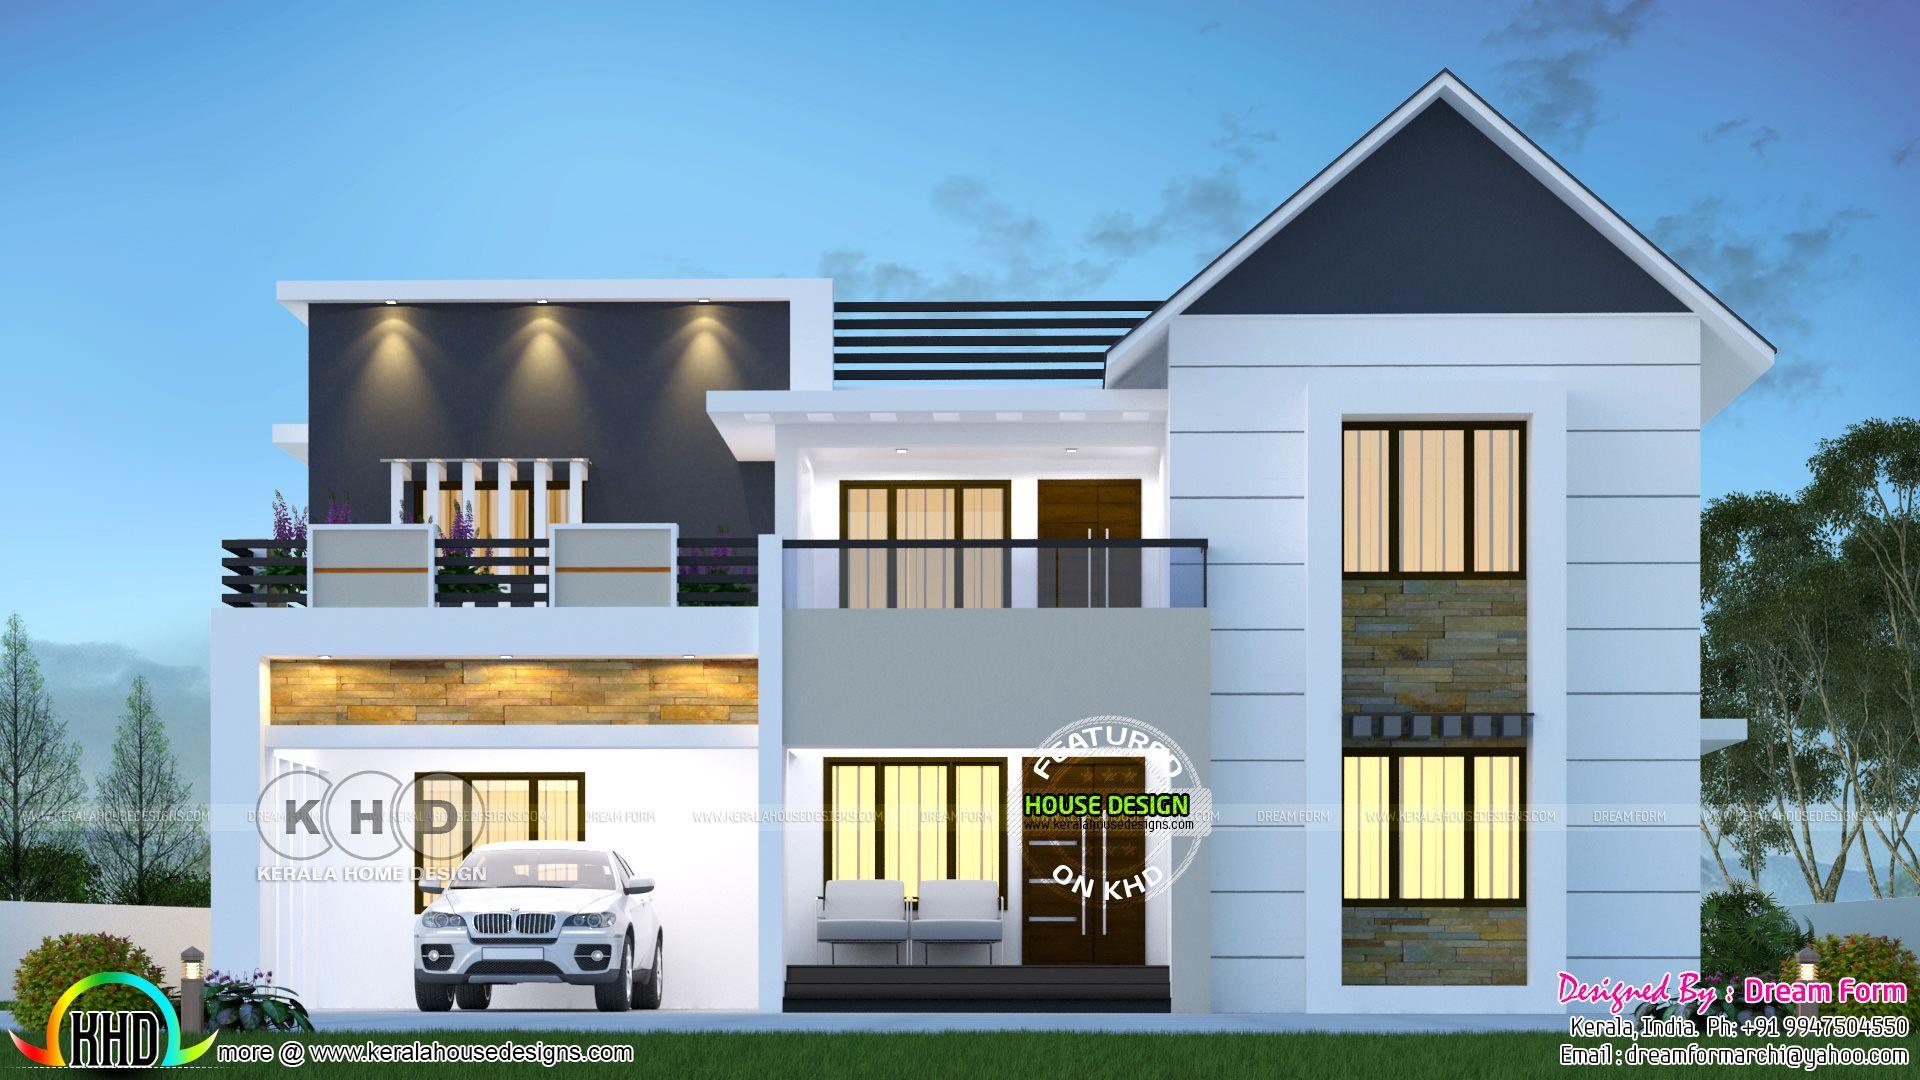 4 Bedroom 2875 Sq Ft Modern Home Design In 2020 Kerala House Design Bungalow House Design 2 Storey House Design